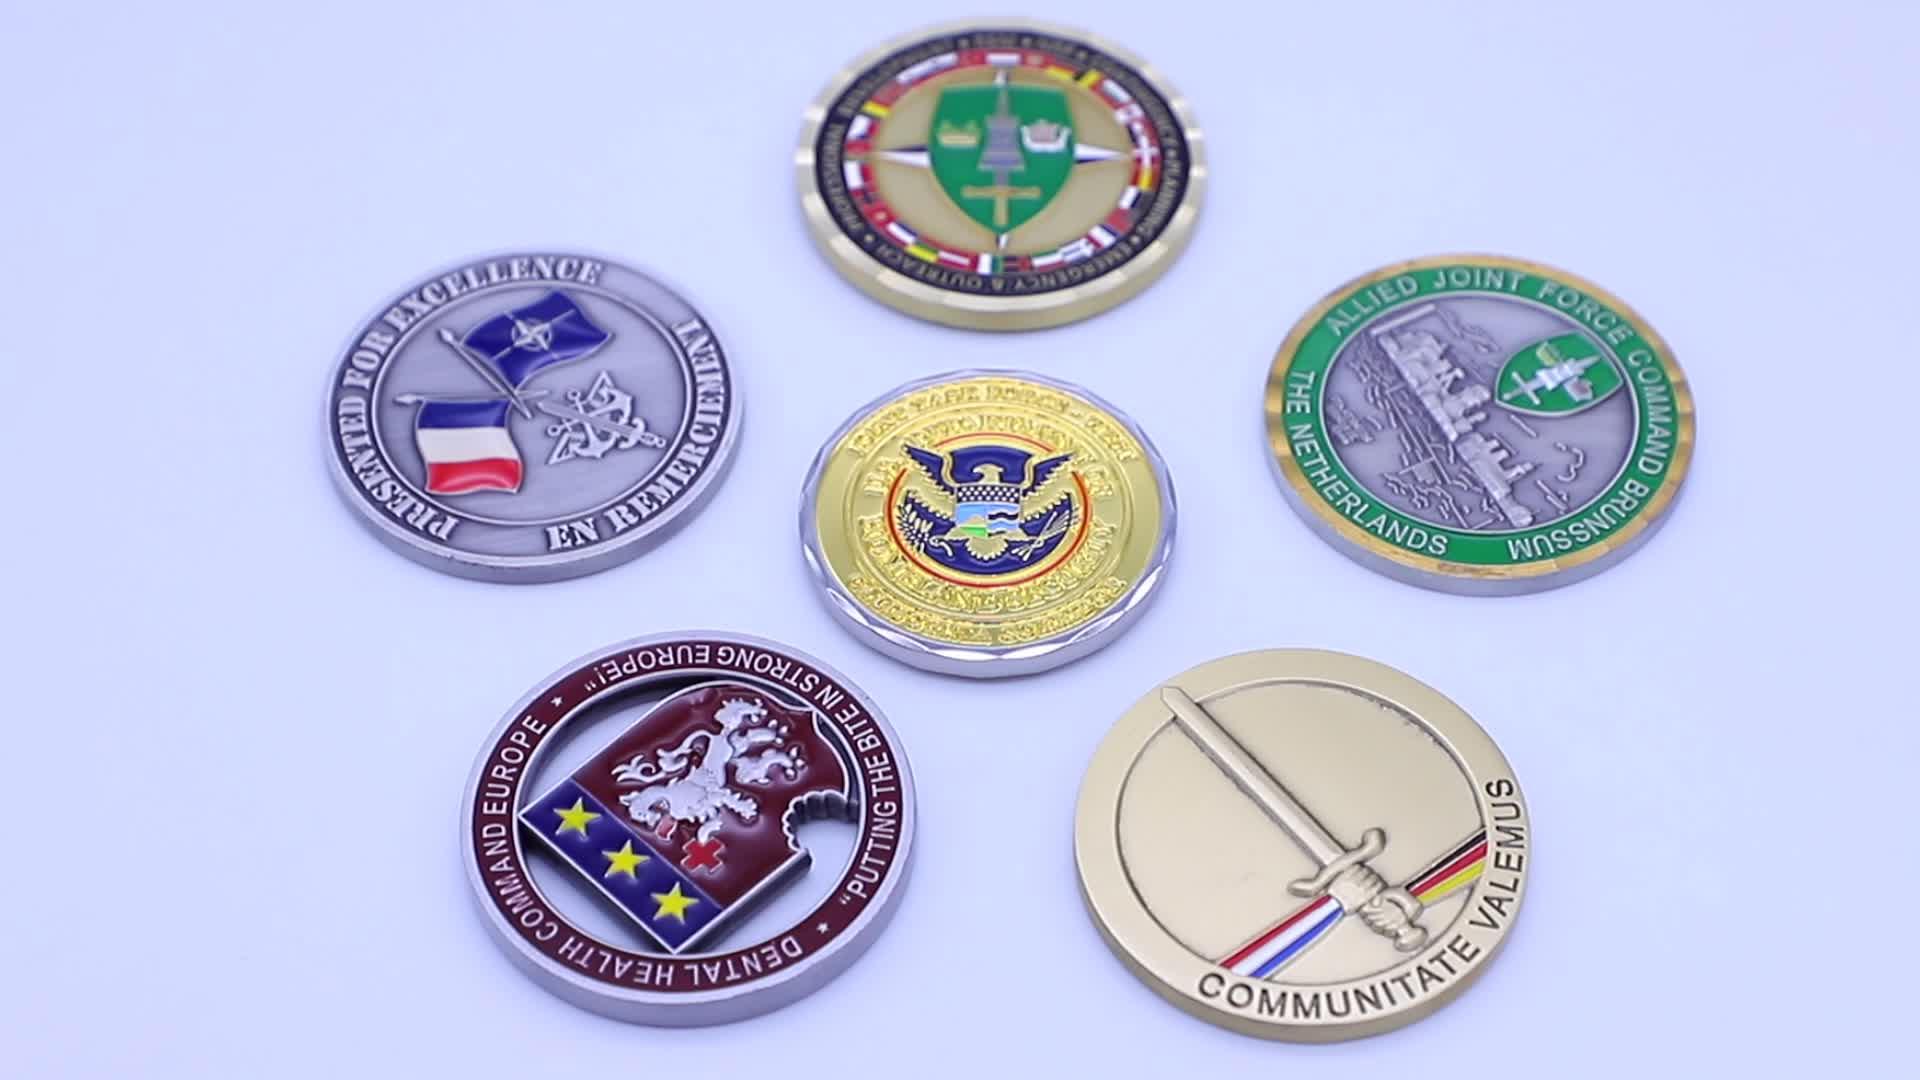 Custom Goedkope Amerikaanse Vlag Munt, US Militaire Vergulde Uitdaging Munten Souvenirs Geen Minimum